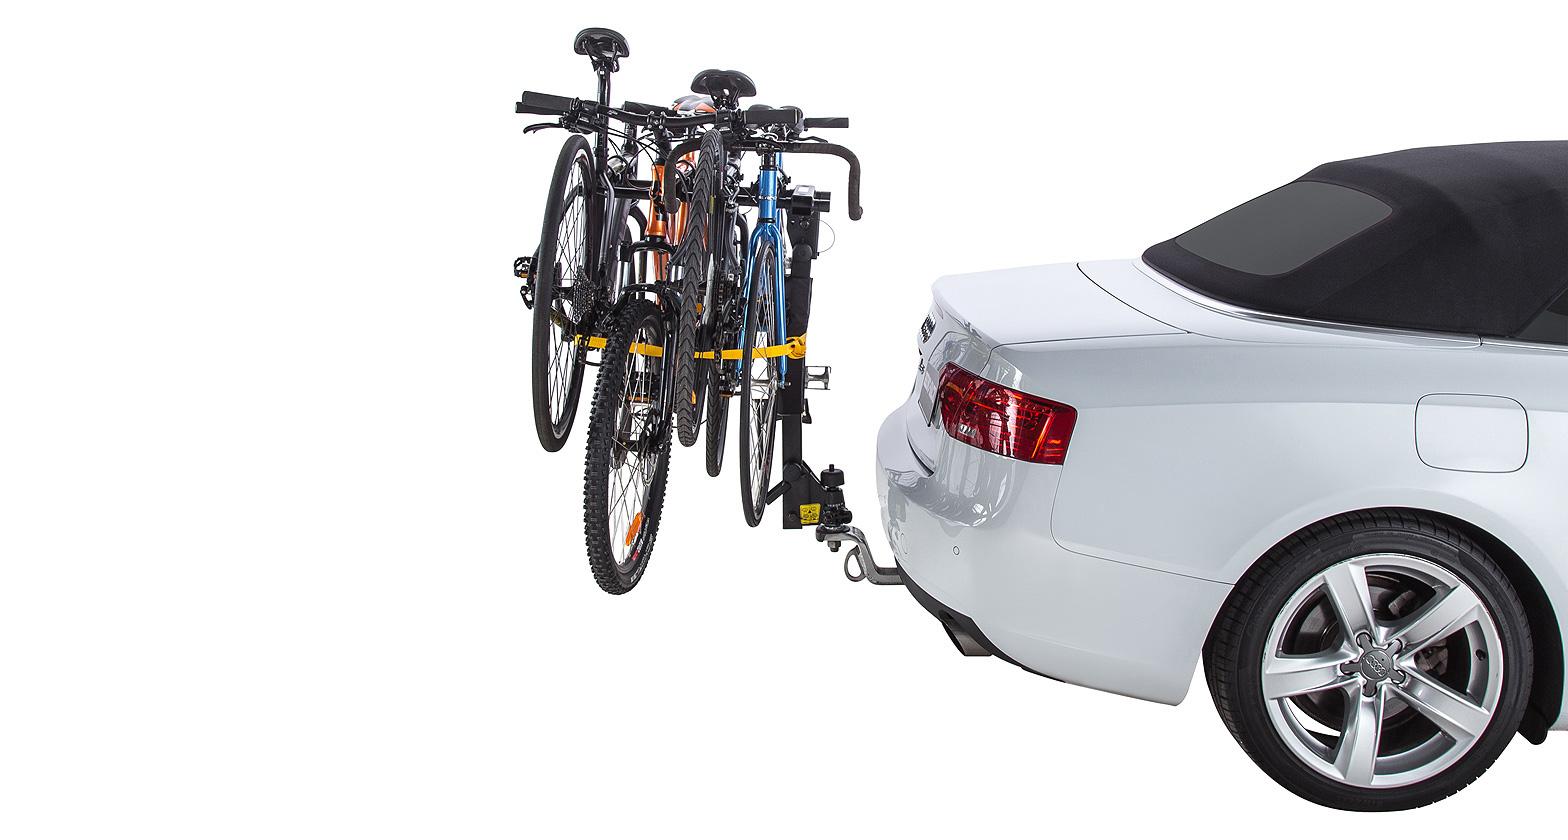 RBC008 - 4 Bike Carrier (Towball Mount) | Rhino-Rack